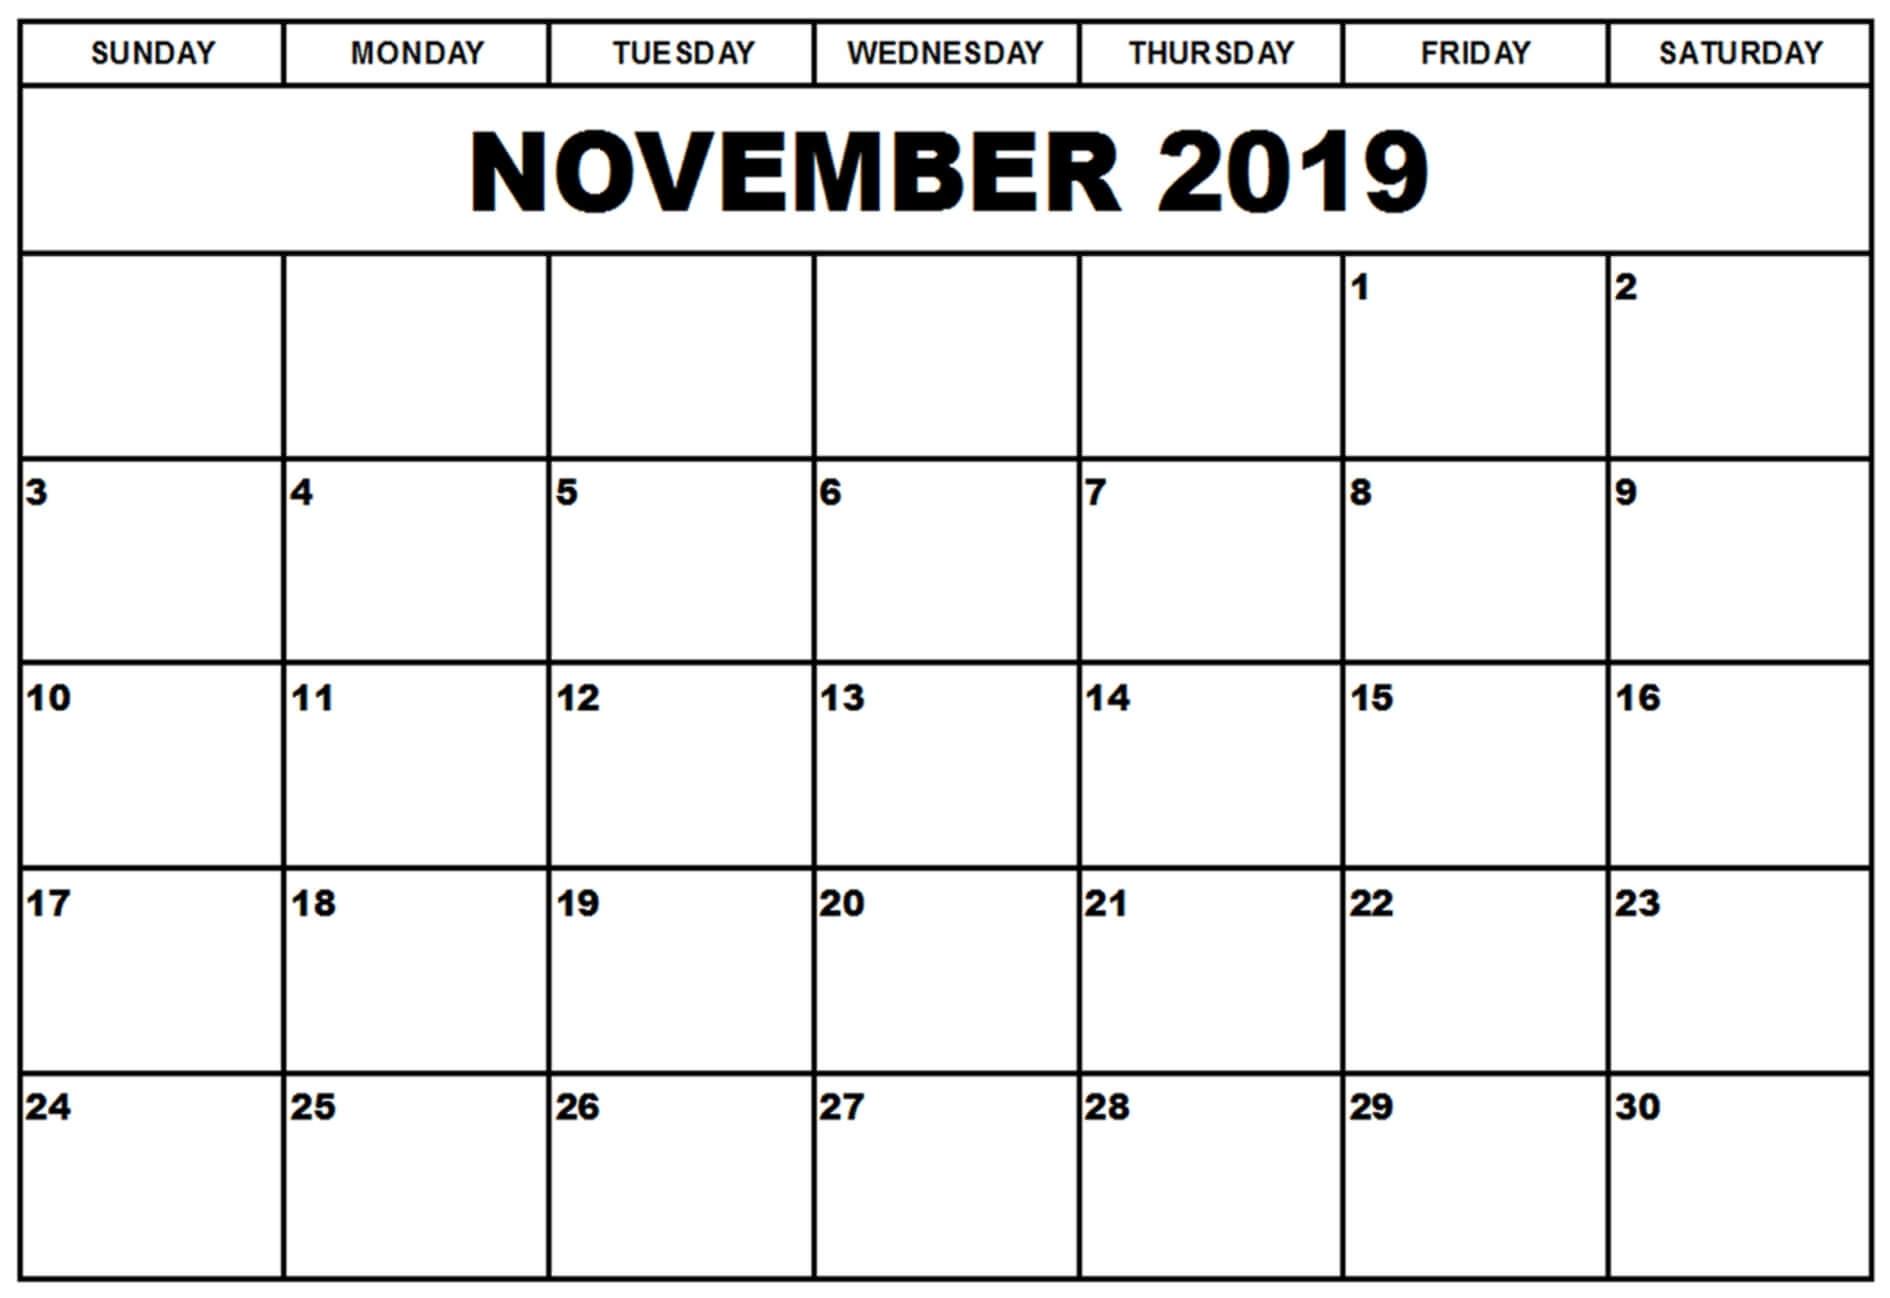 Calendar November 2019 Printable Template - 2019 Calendars